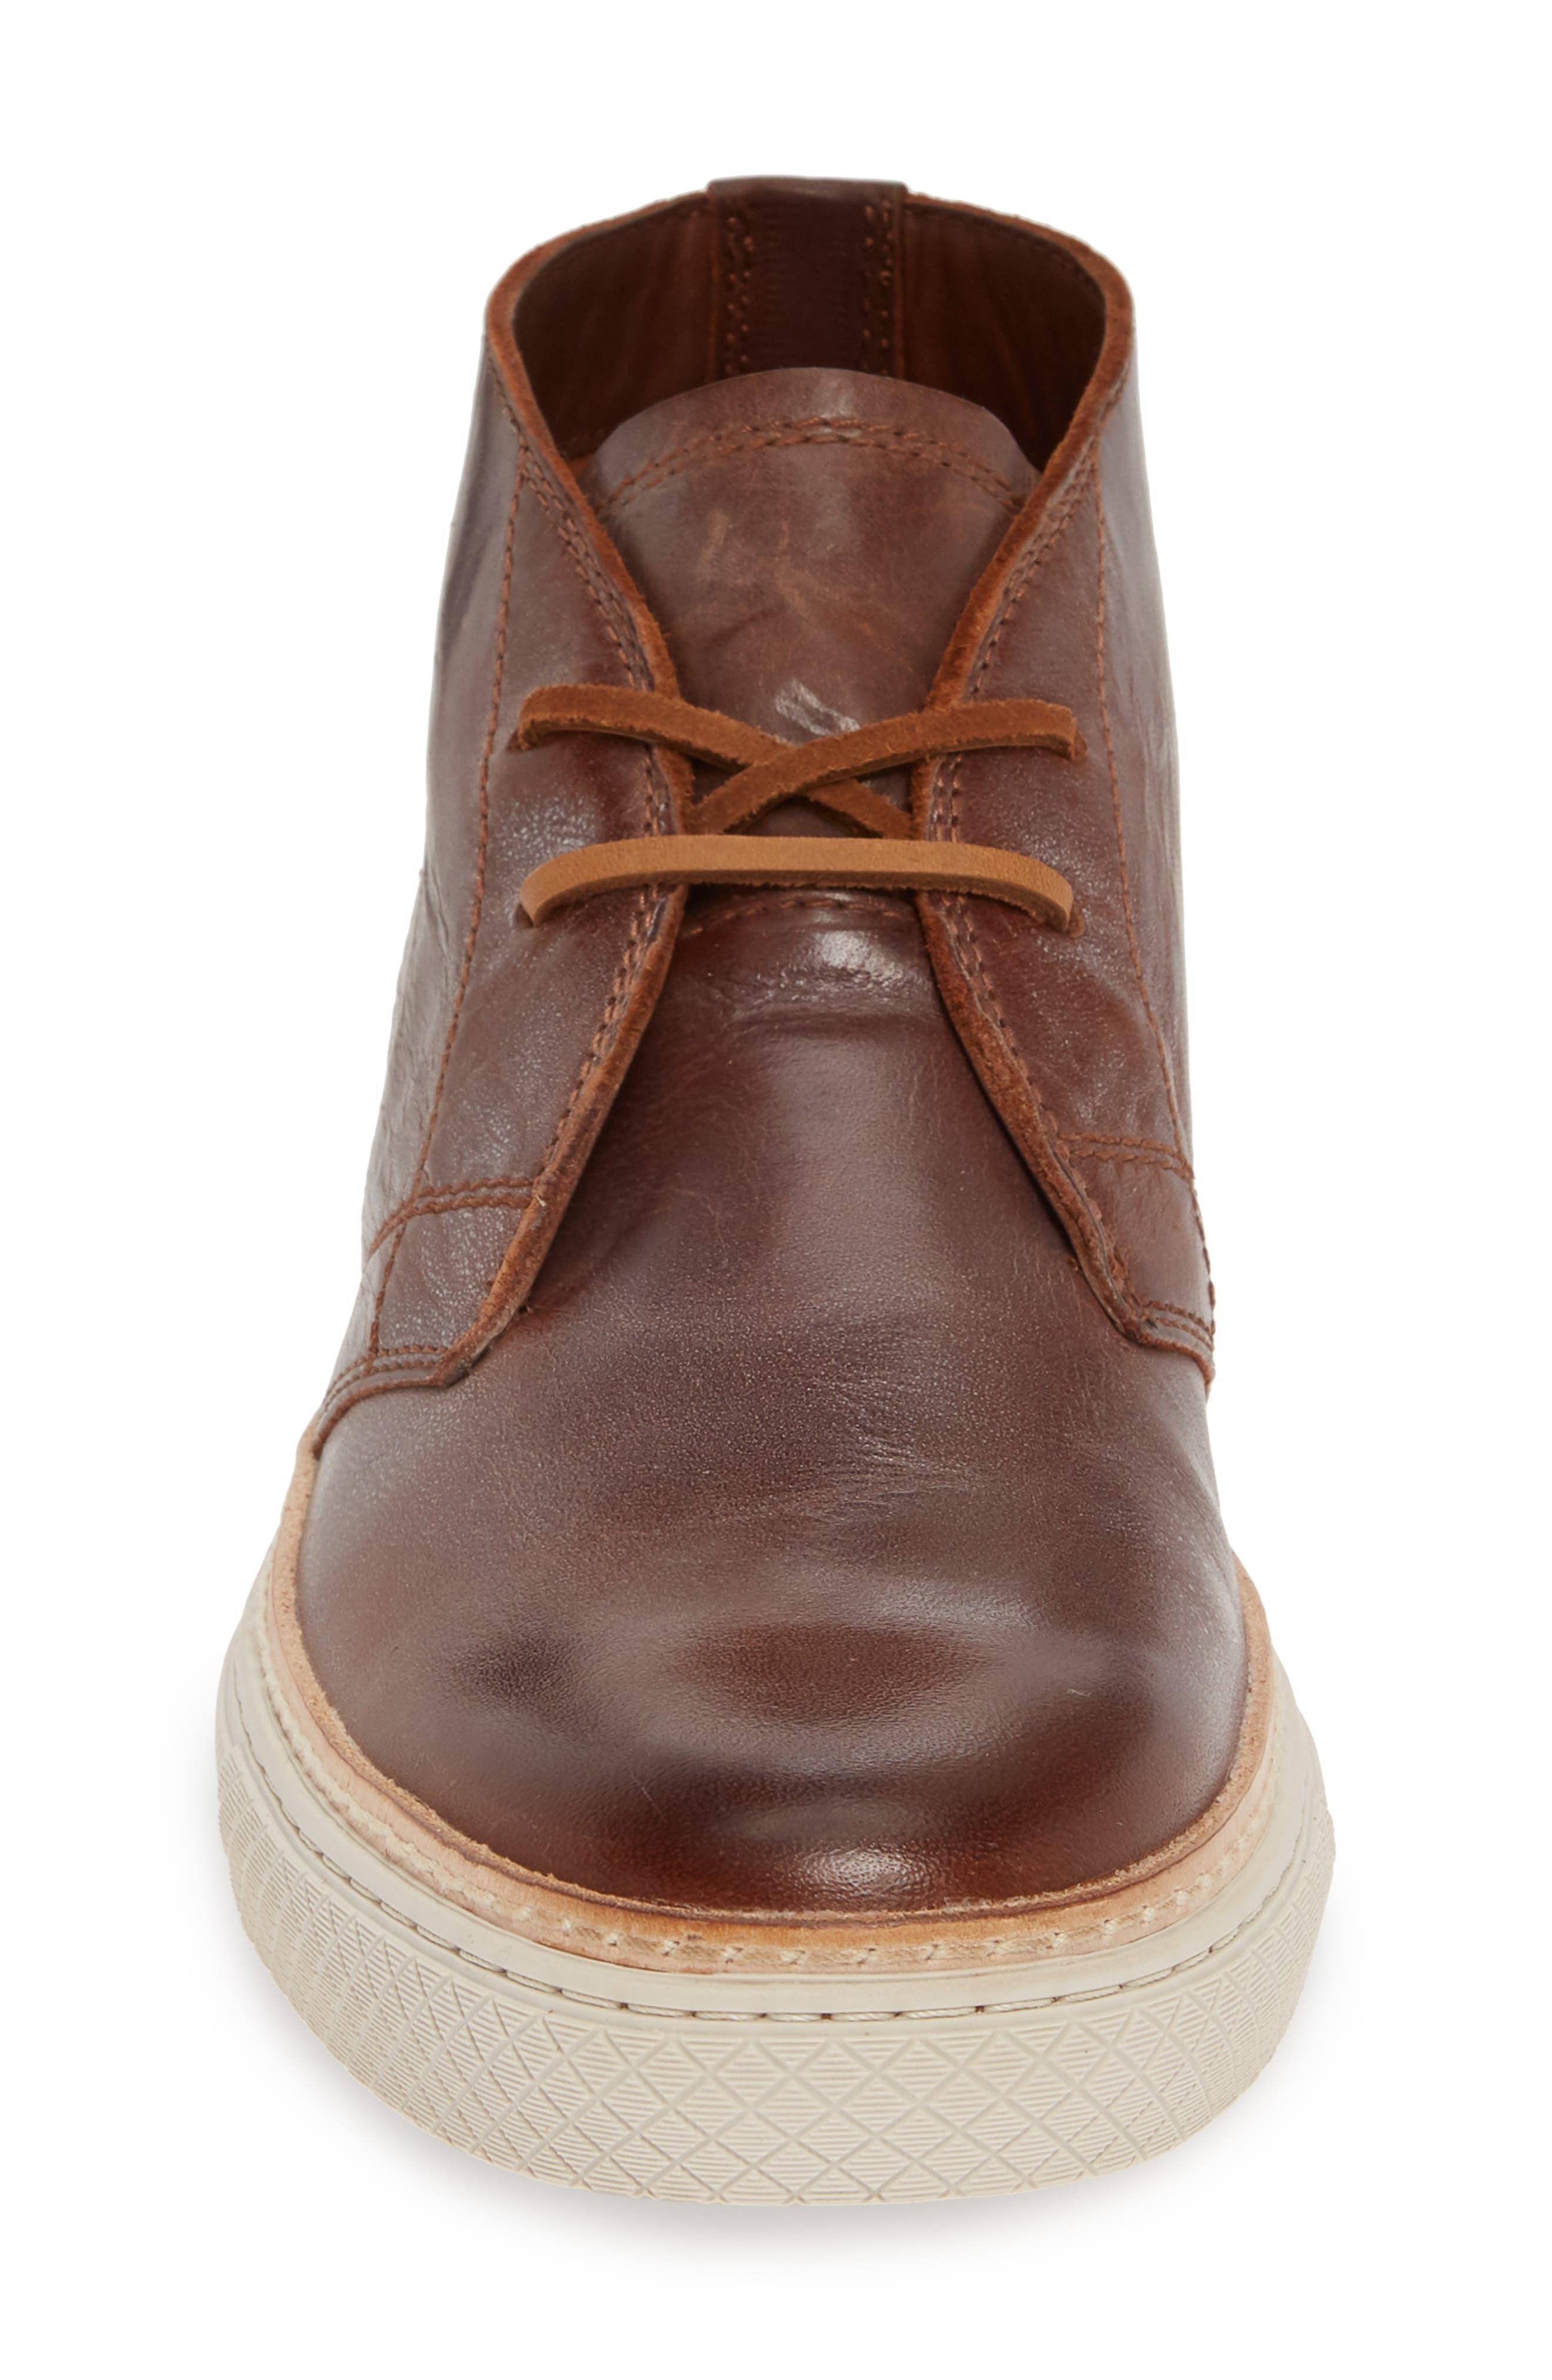 Essex Chukka Boot,                             Alternate thumbnail 4, color,                             COGNAC LEATHER